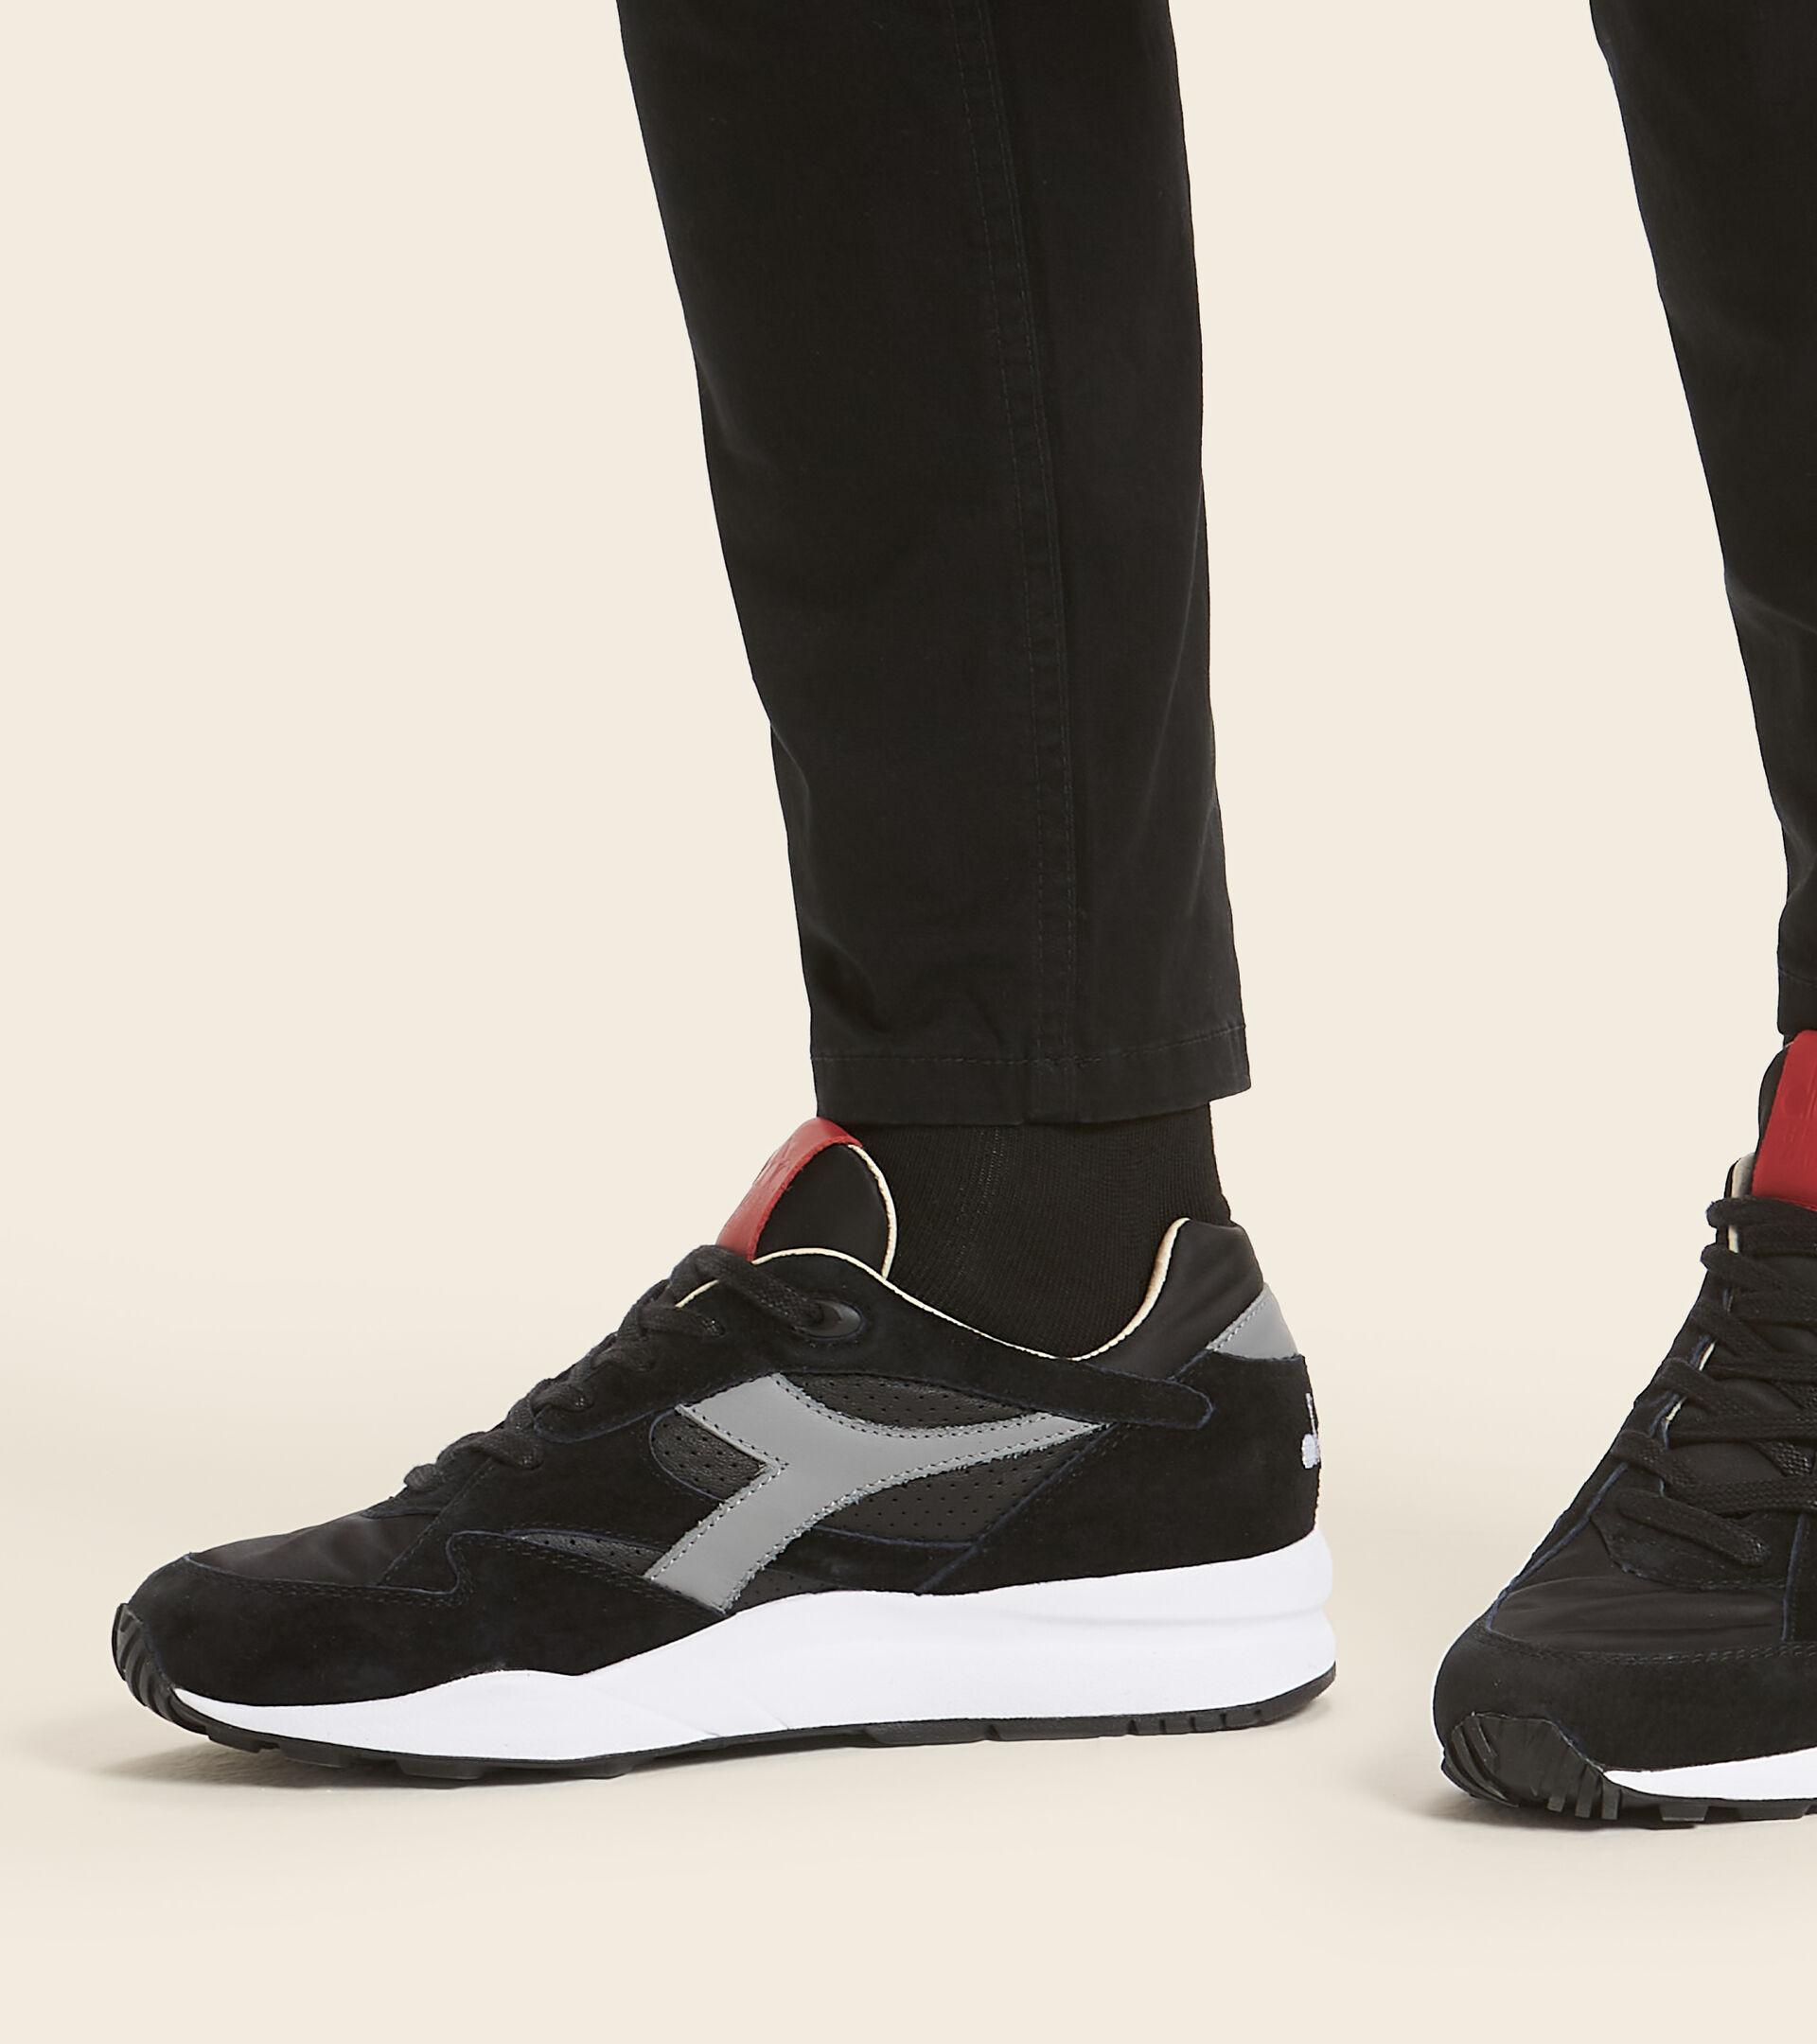 Heritage-Schuh Made in Italy - Herren ECLIPSE ITALIA SCHWARZ - Diadora